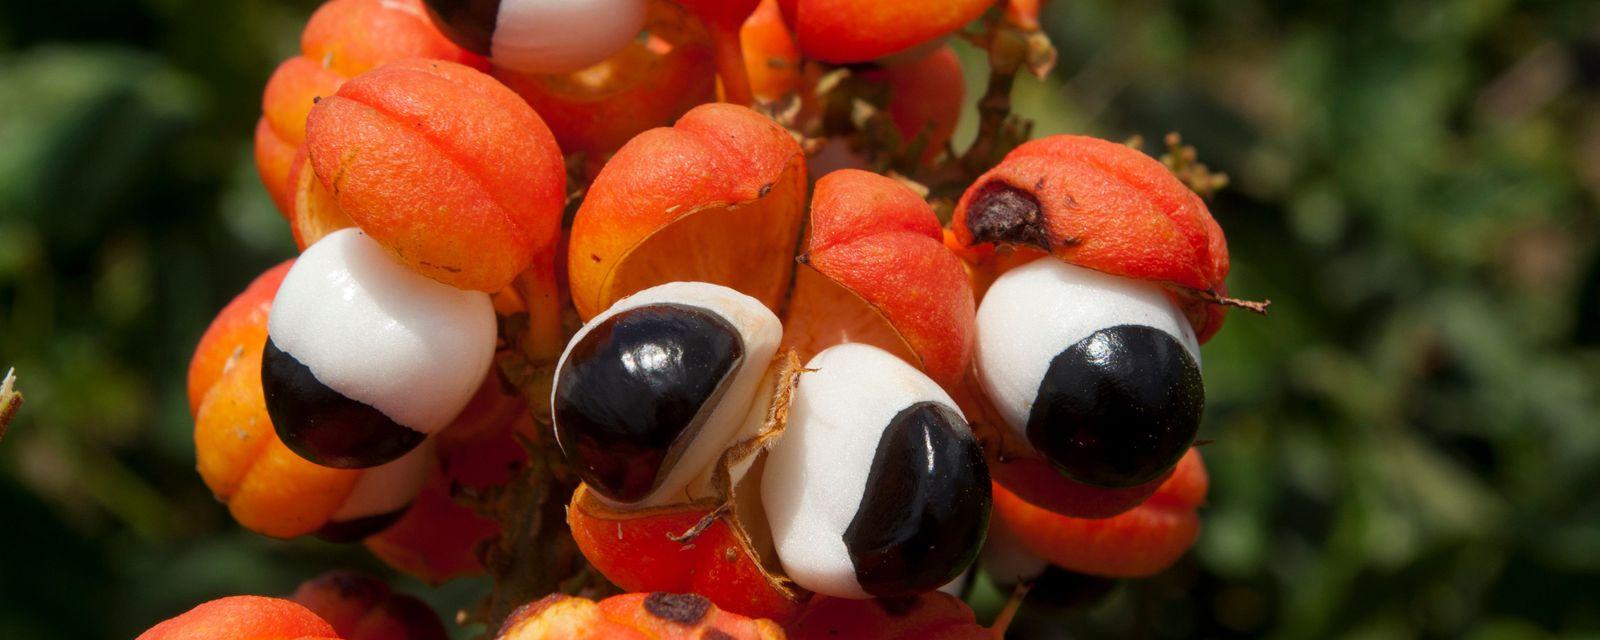 Guarana the edible eye of the Amazon